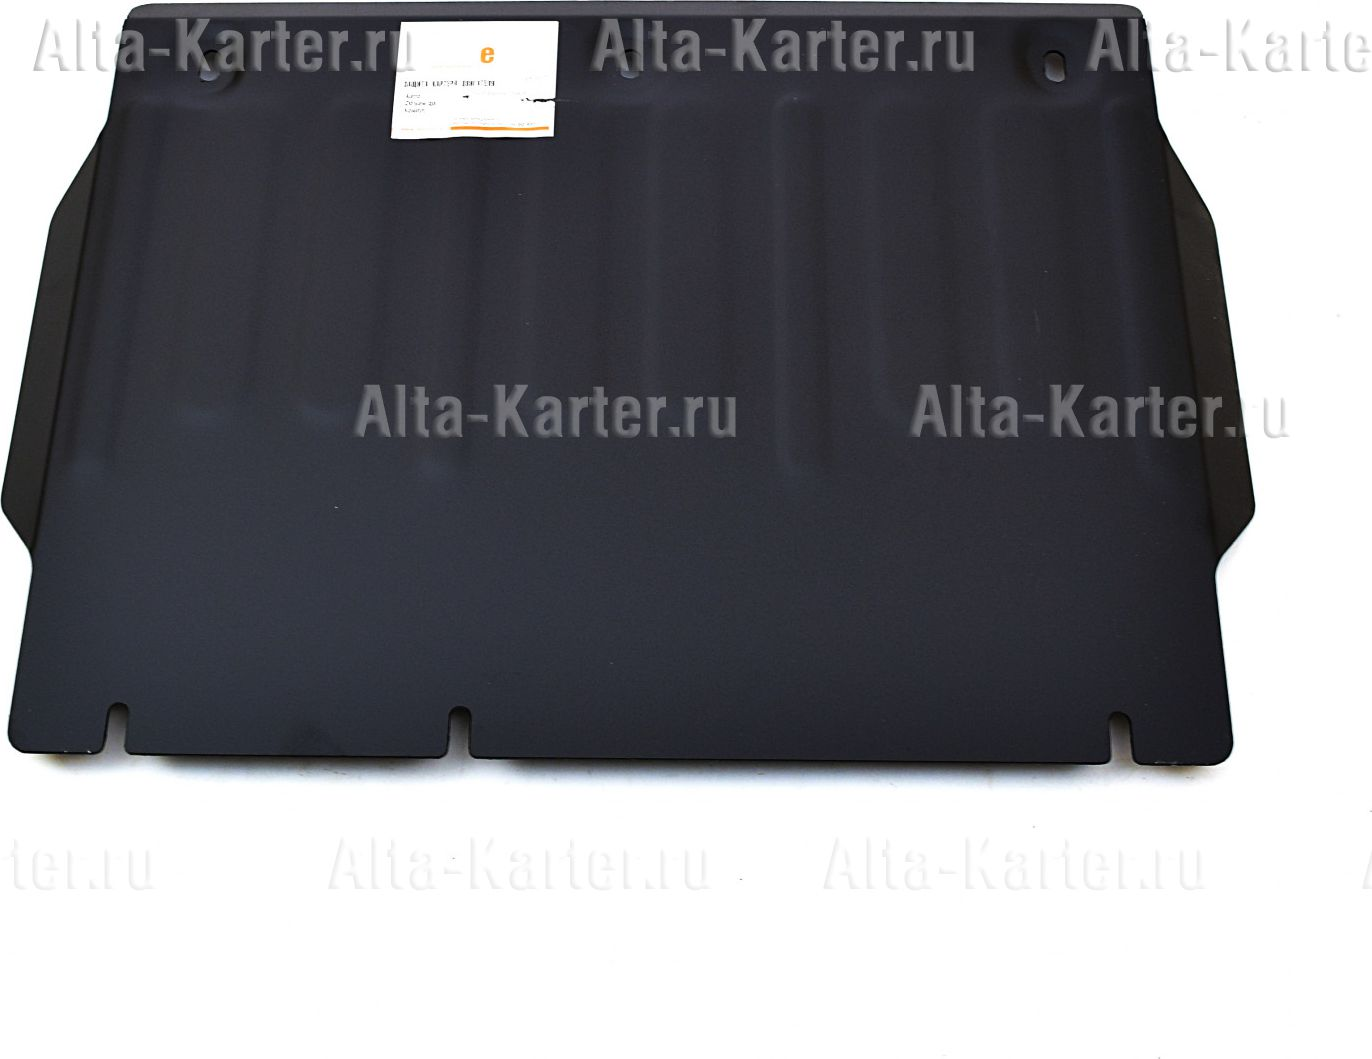 Защита Alfeco для раздатки Ford Ranger IV Double Cab 2012-2021. Артикул ALF.07.31